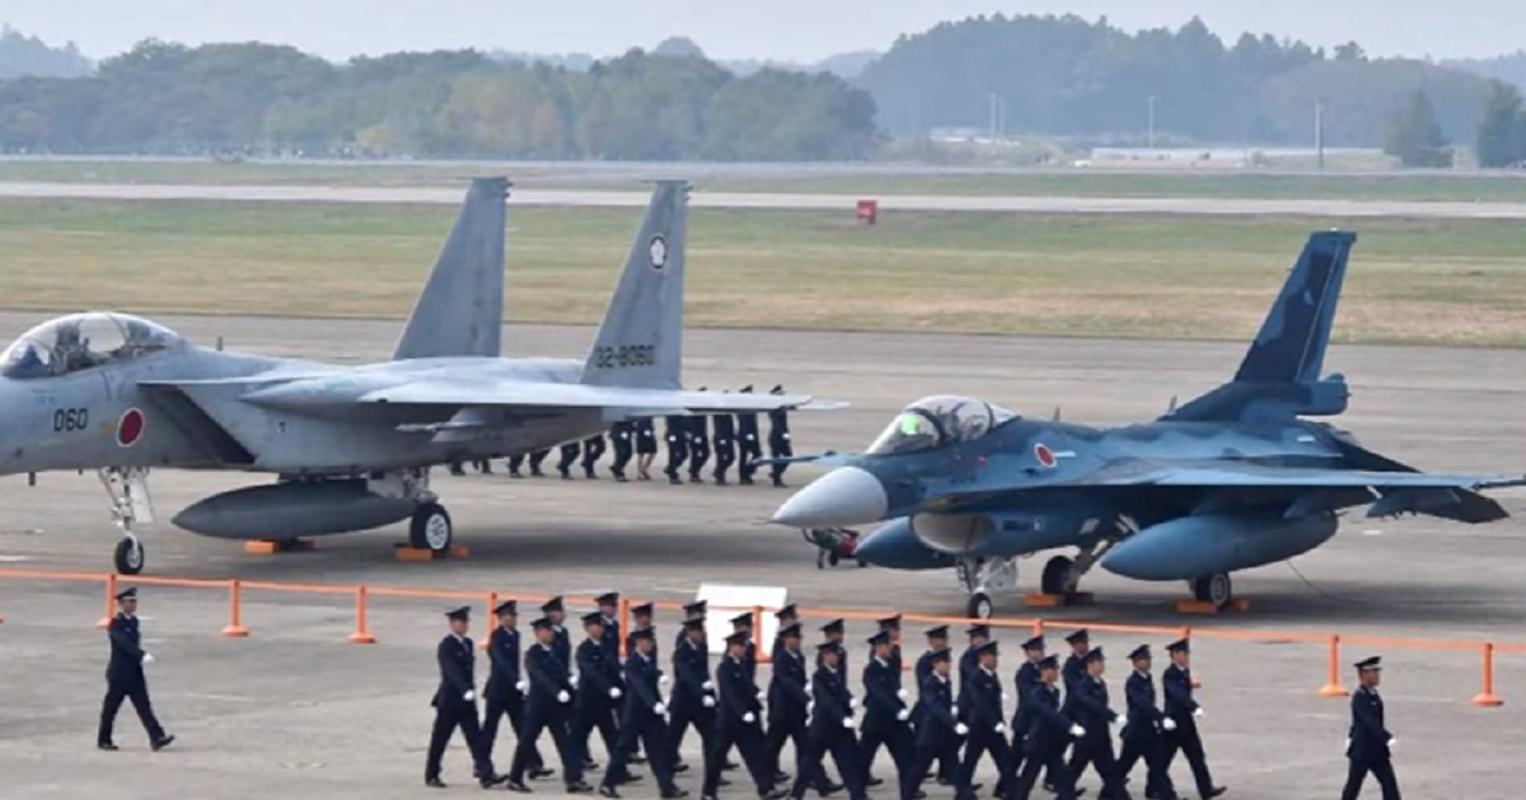 Nhat co thuc su can toi tiem kich F-35 de doi pho Trung Quoc?-Hinh-18